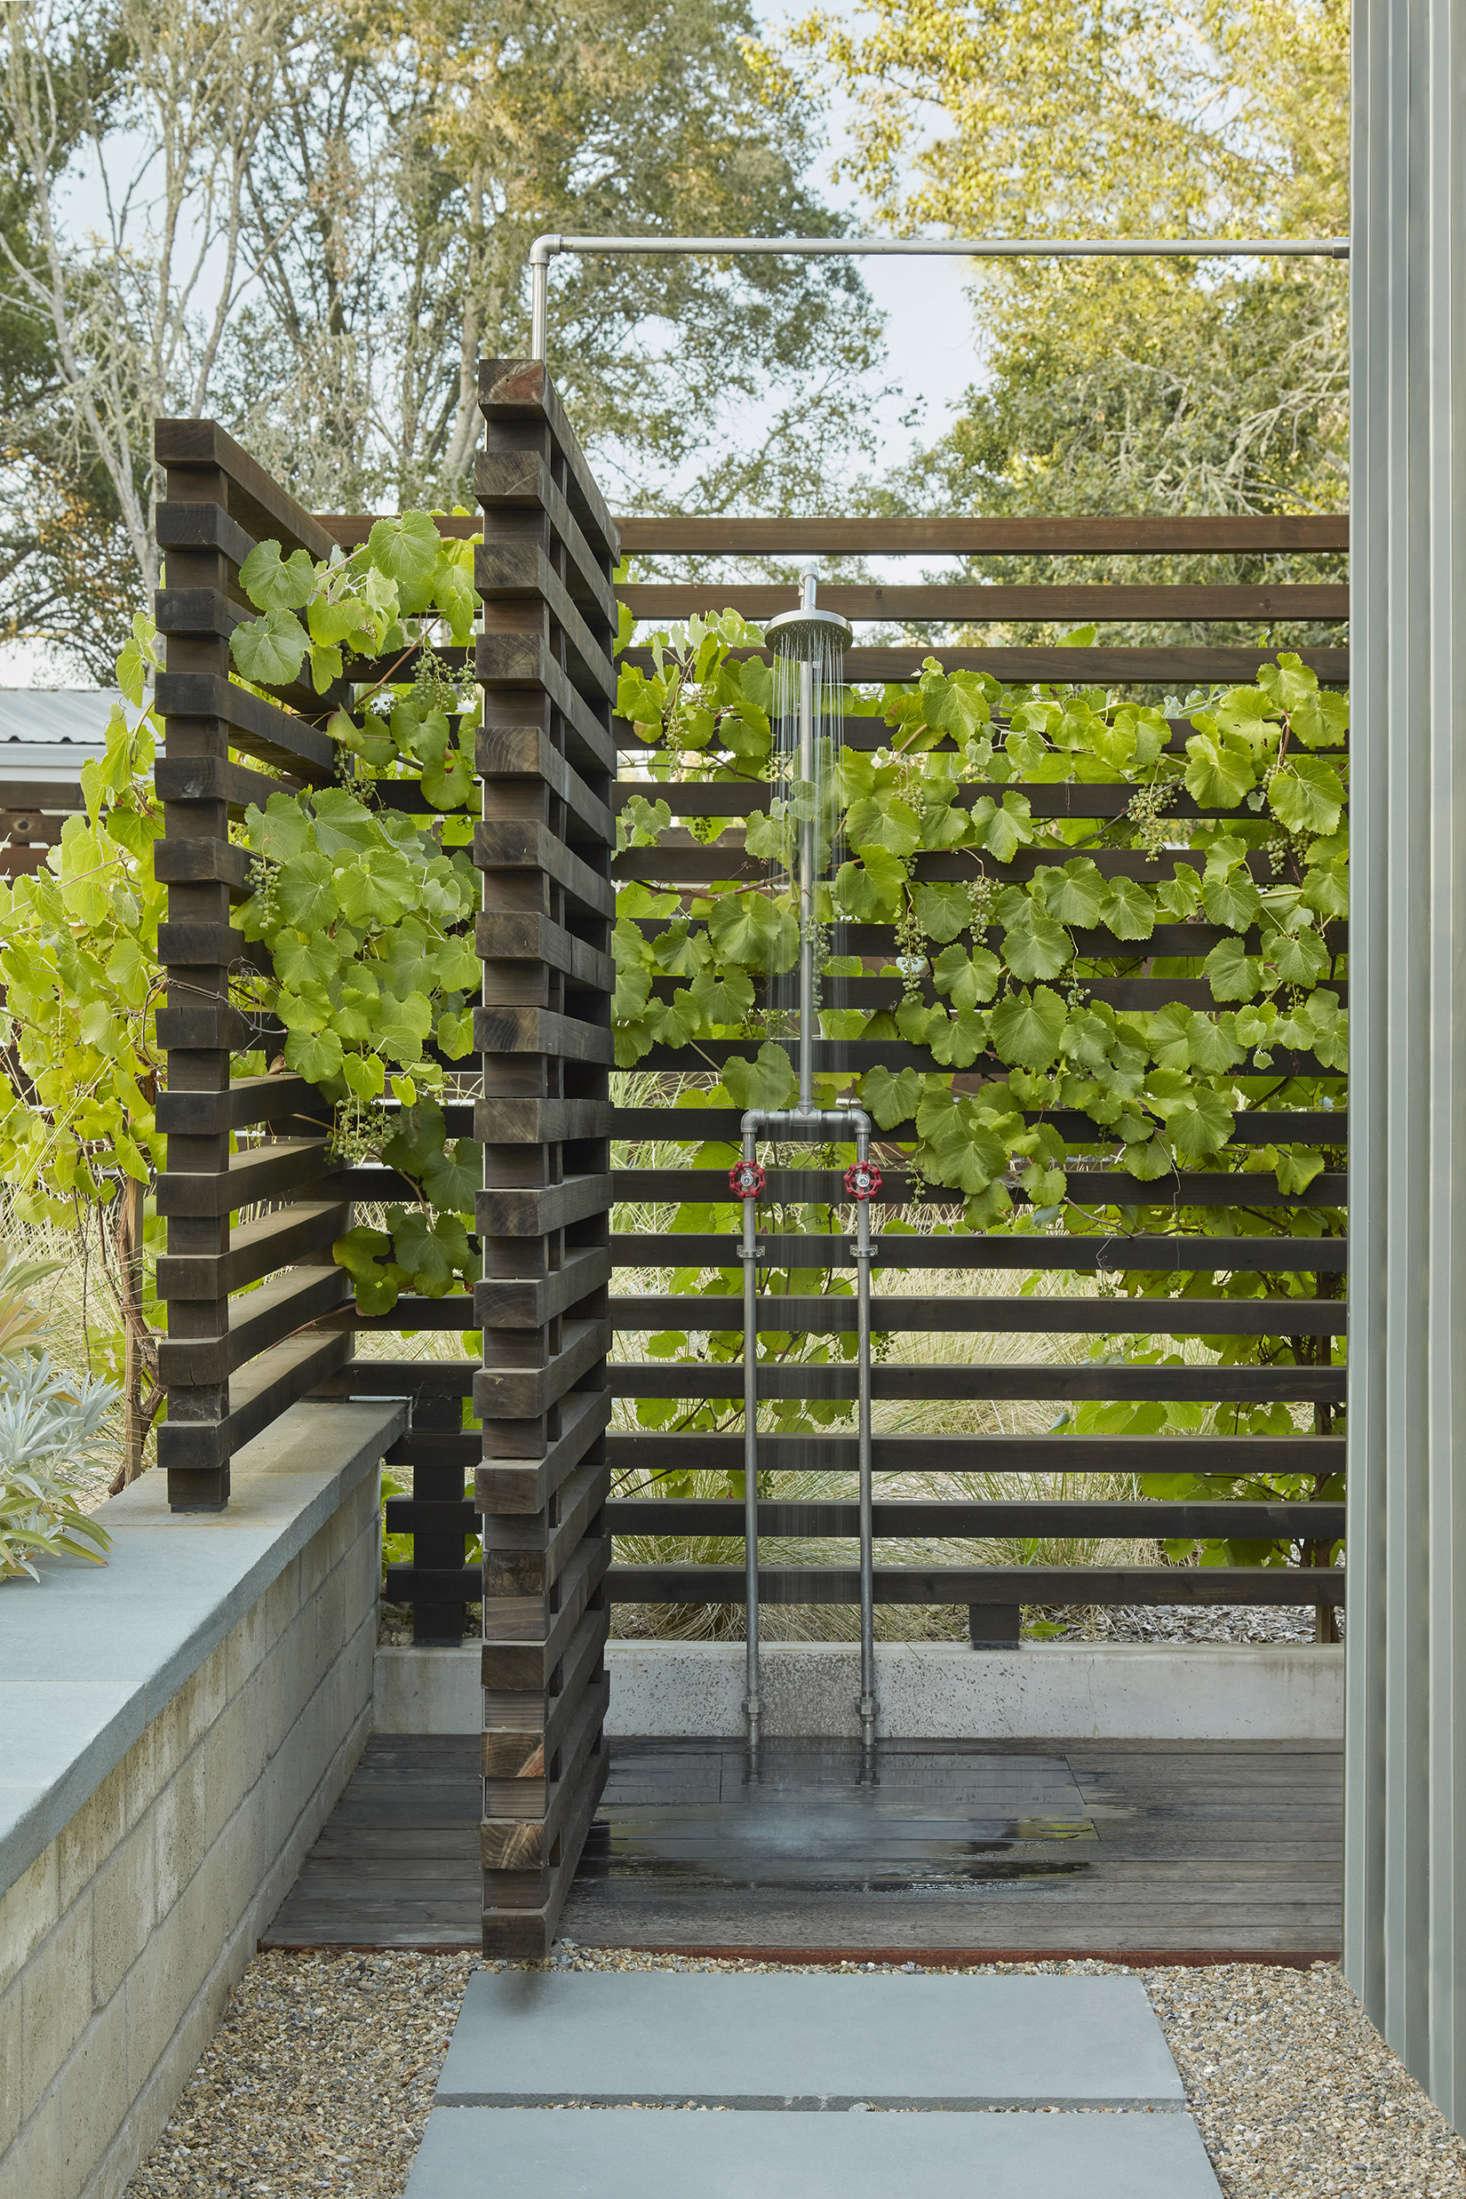 The outdoor shower features native grape vines peeking through.